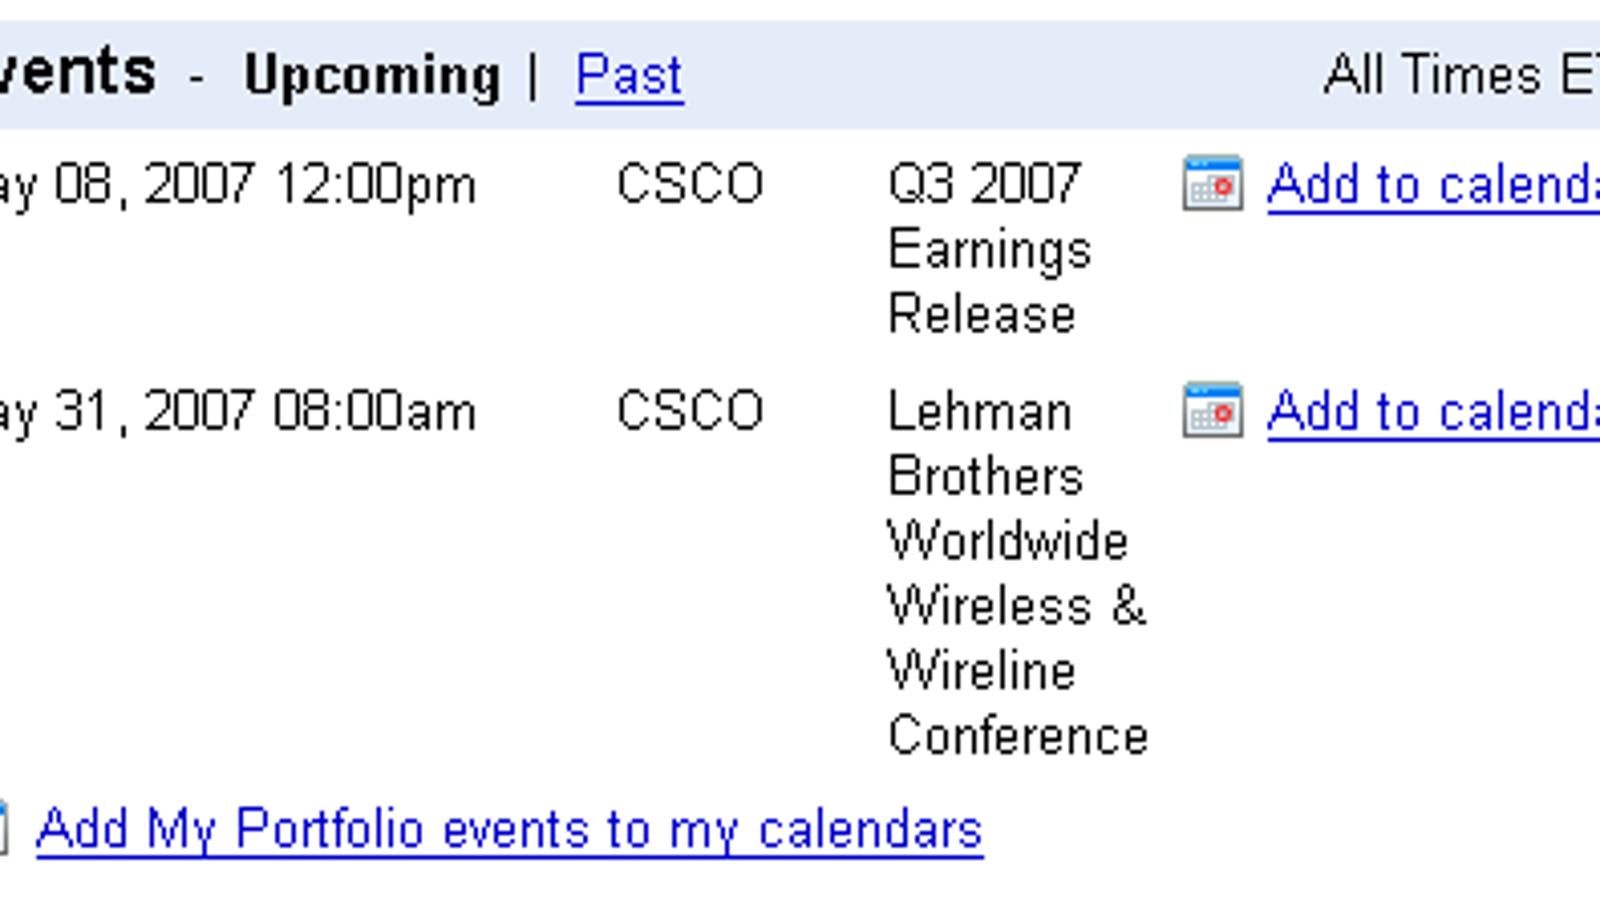 Add Google Finance events to Google Calendar